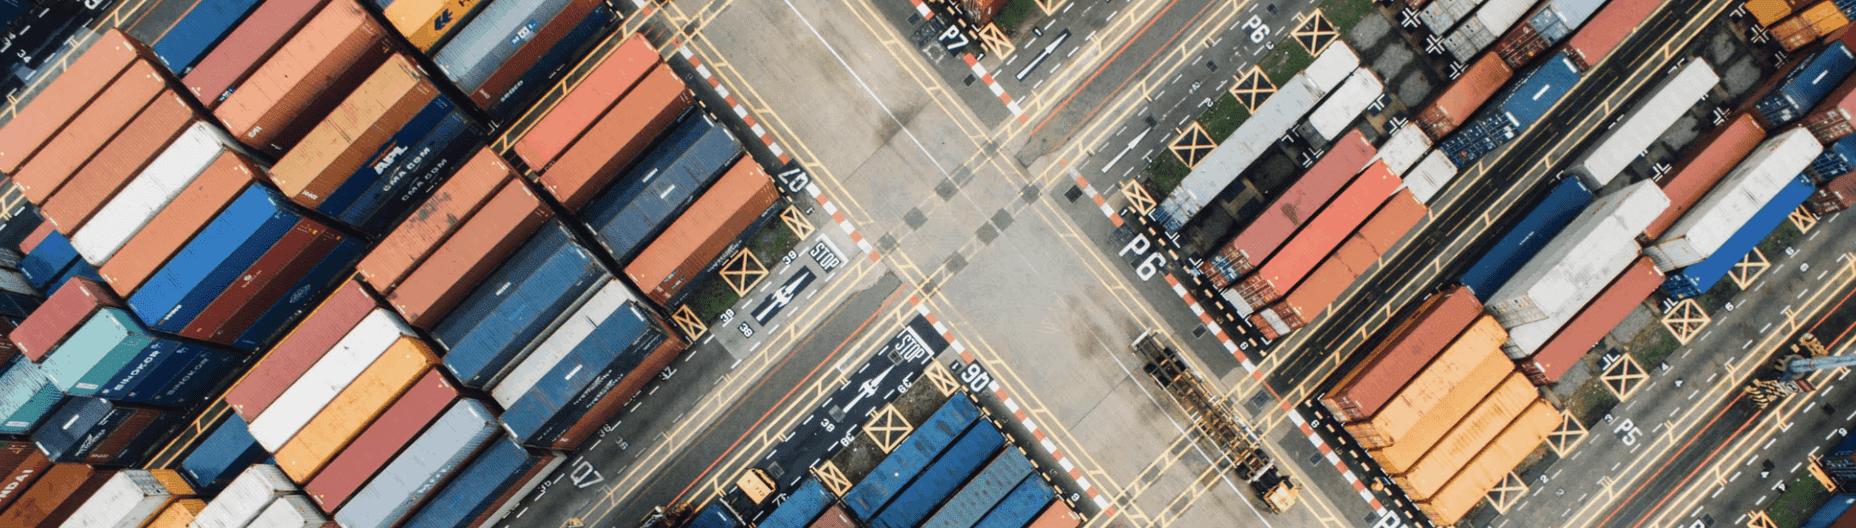 Datenbank Logistik Deutschland